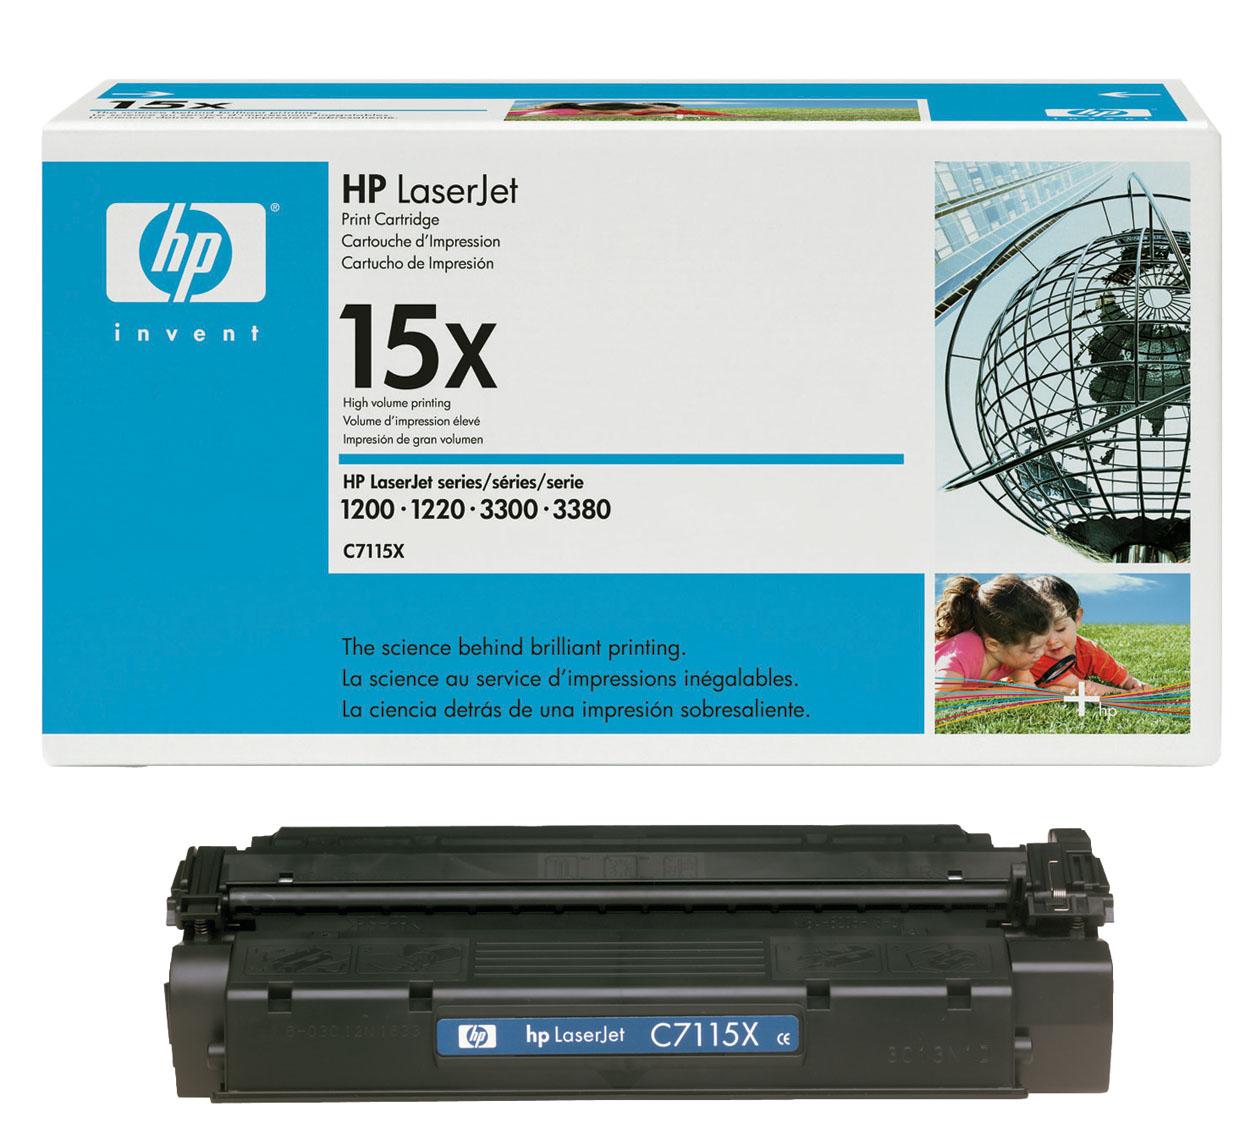 Hp Printer Ink Cartridges Inkjet Color Laserjet Cp4005 Cyan Cartridge Cb401a Toner Replacement